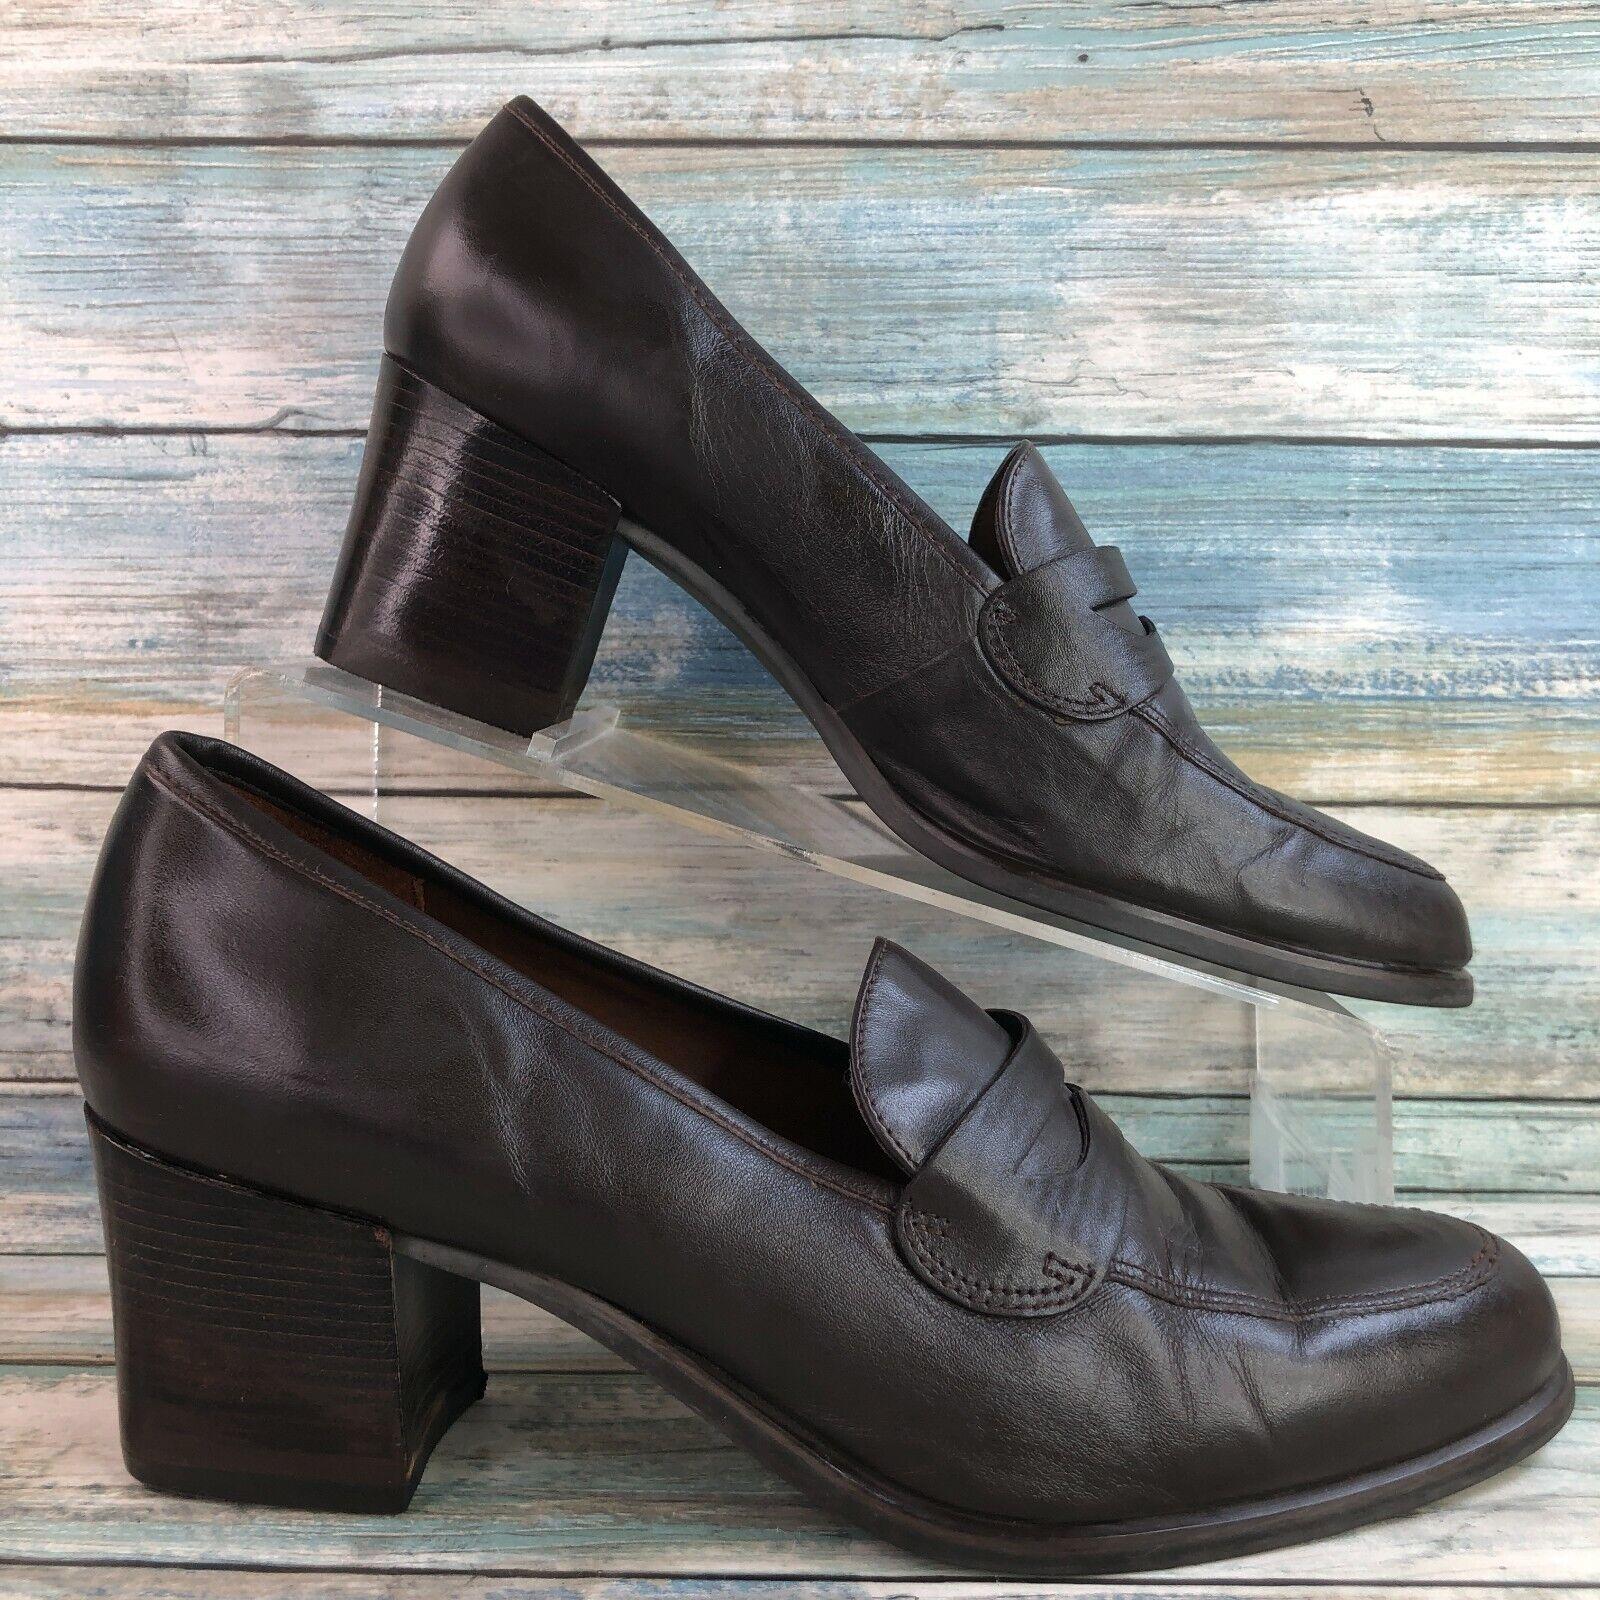 Etienne Aigner Waldo Women's Brown Soft Leather Dress Shoes Block Heel Size 8.5M